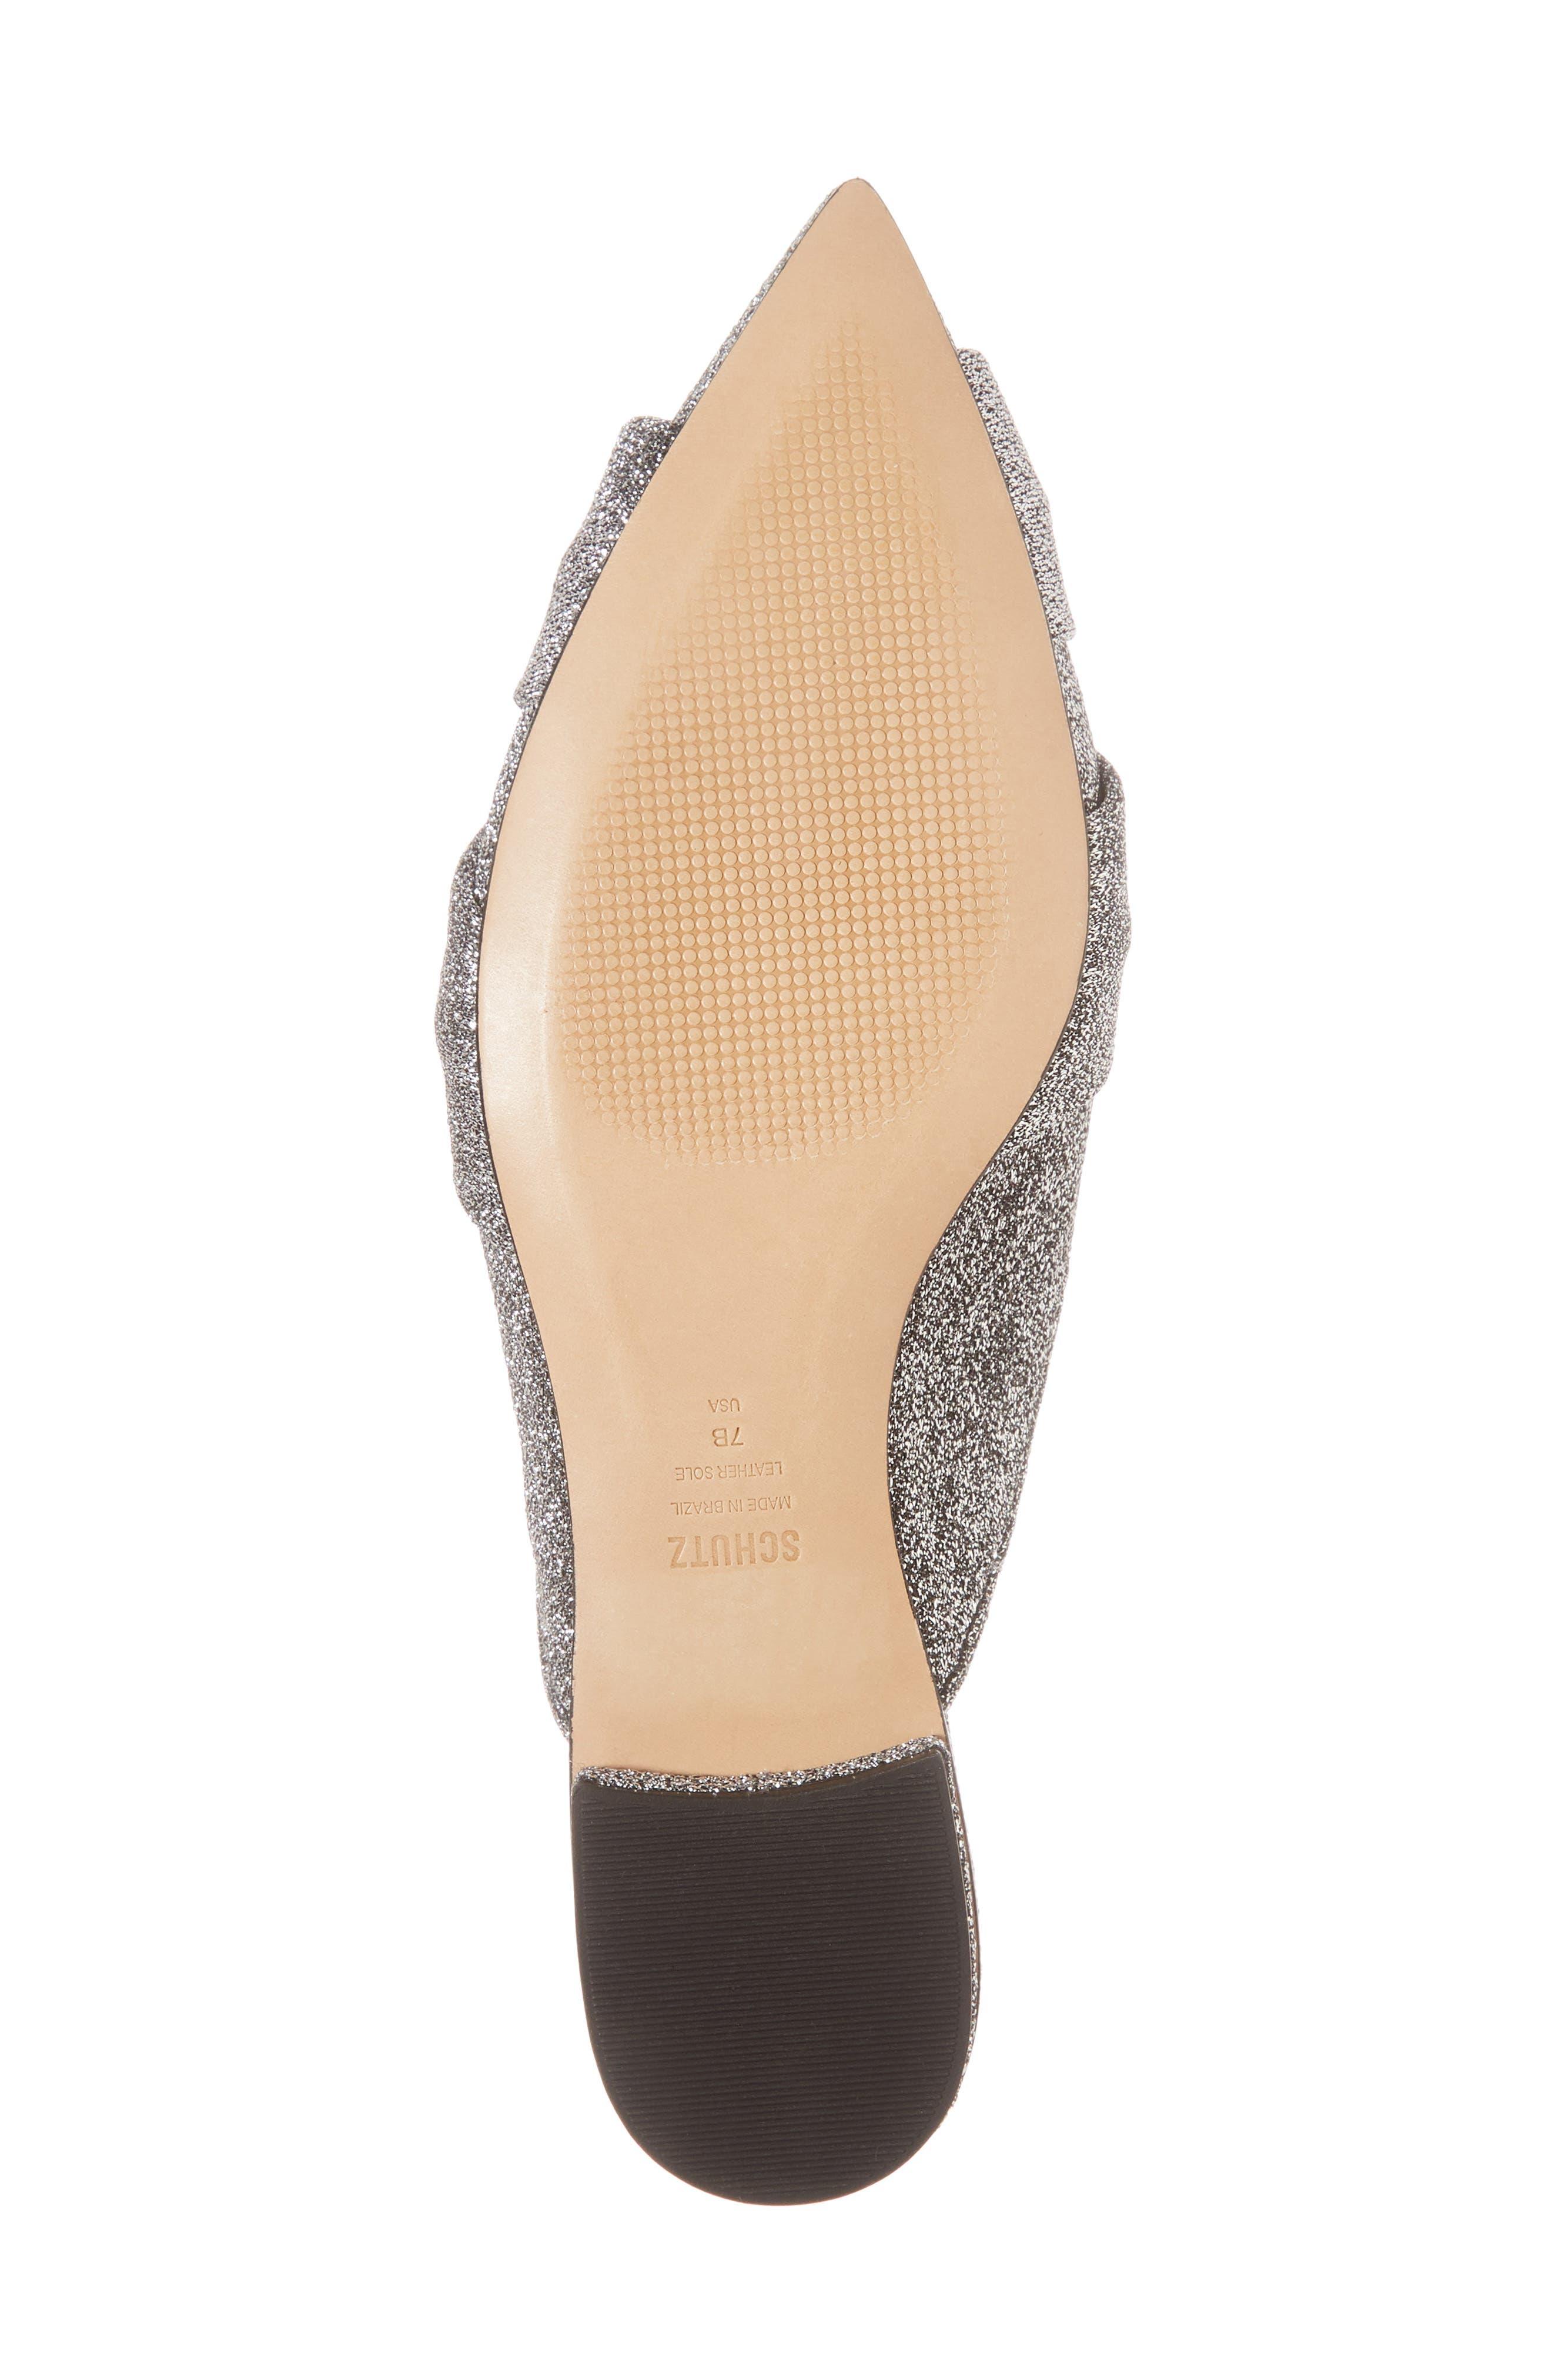 Tina Pointy Toe Slide Sandal,                             Alternate thumbnail 6, color,                             040